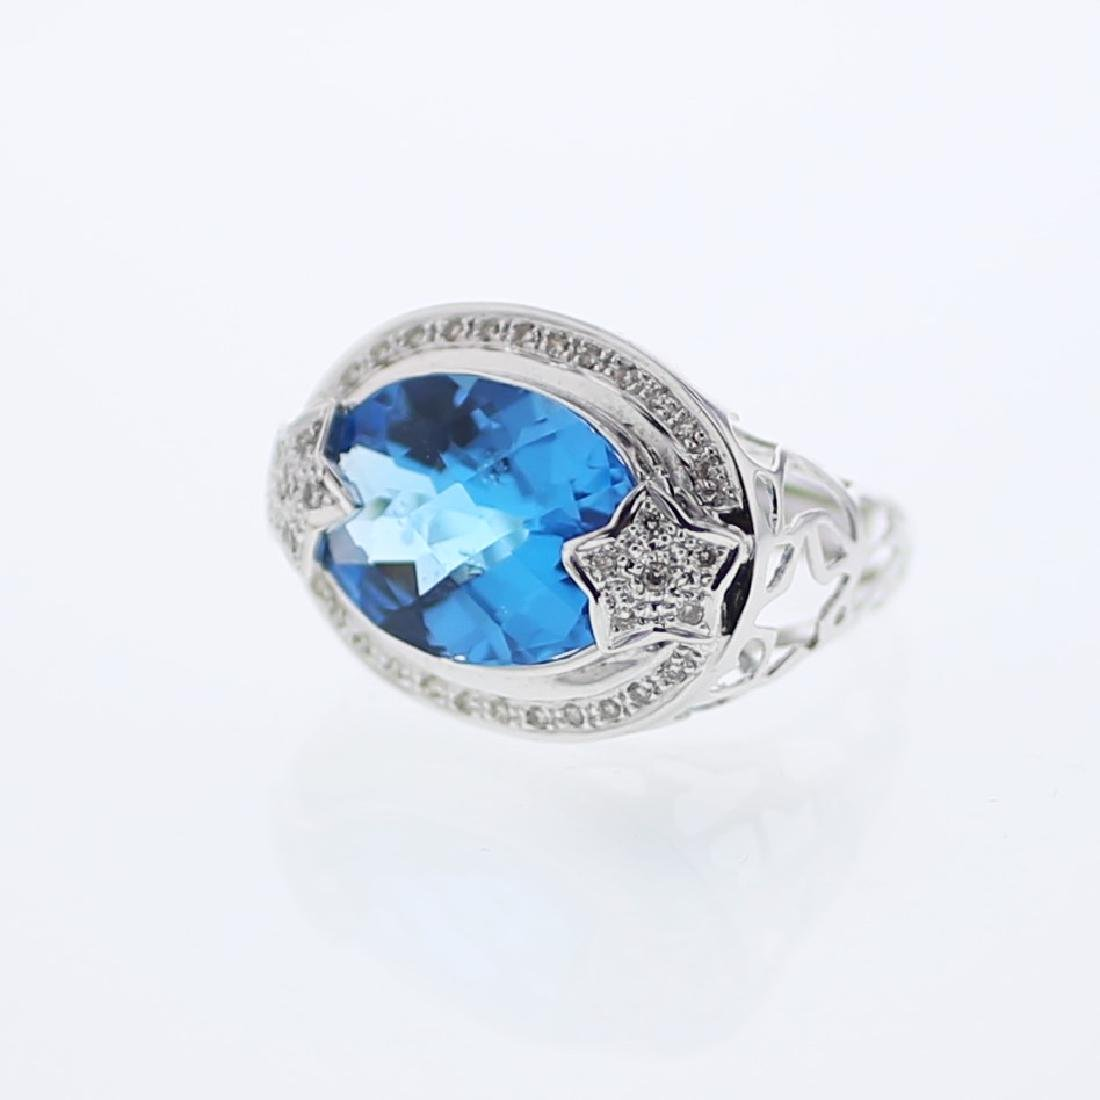 14KT White Gold 10.70ct Blue Topaz and Diamond Ring